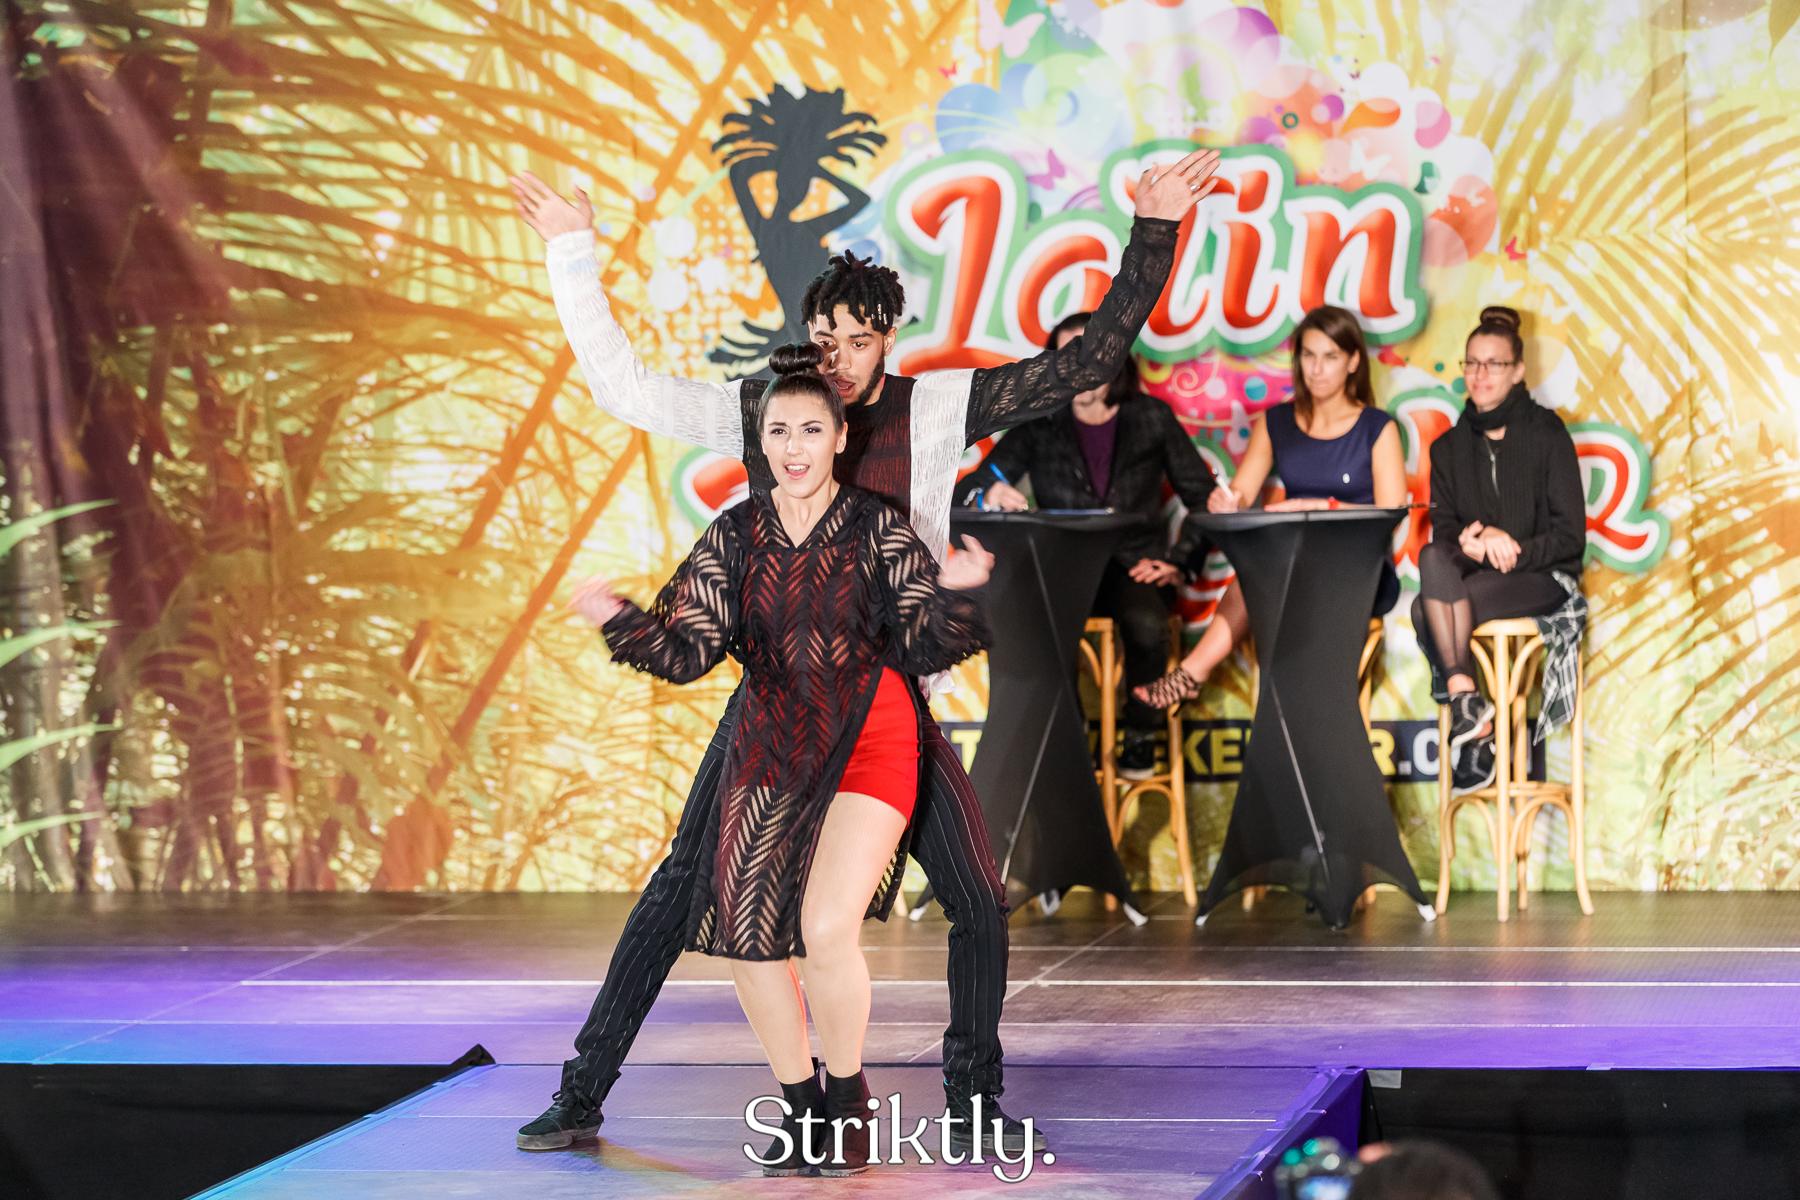 Striktly DF Contest - outfit designer Lida